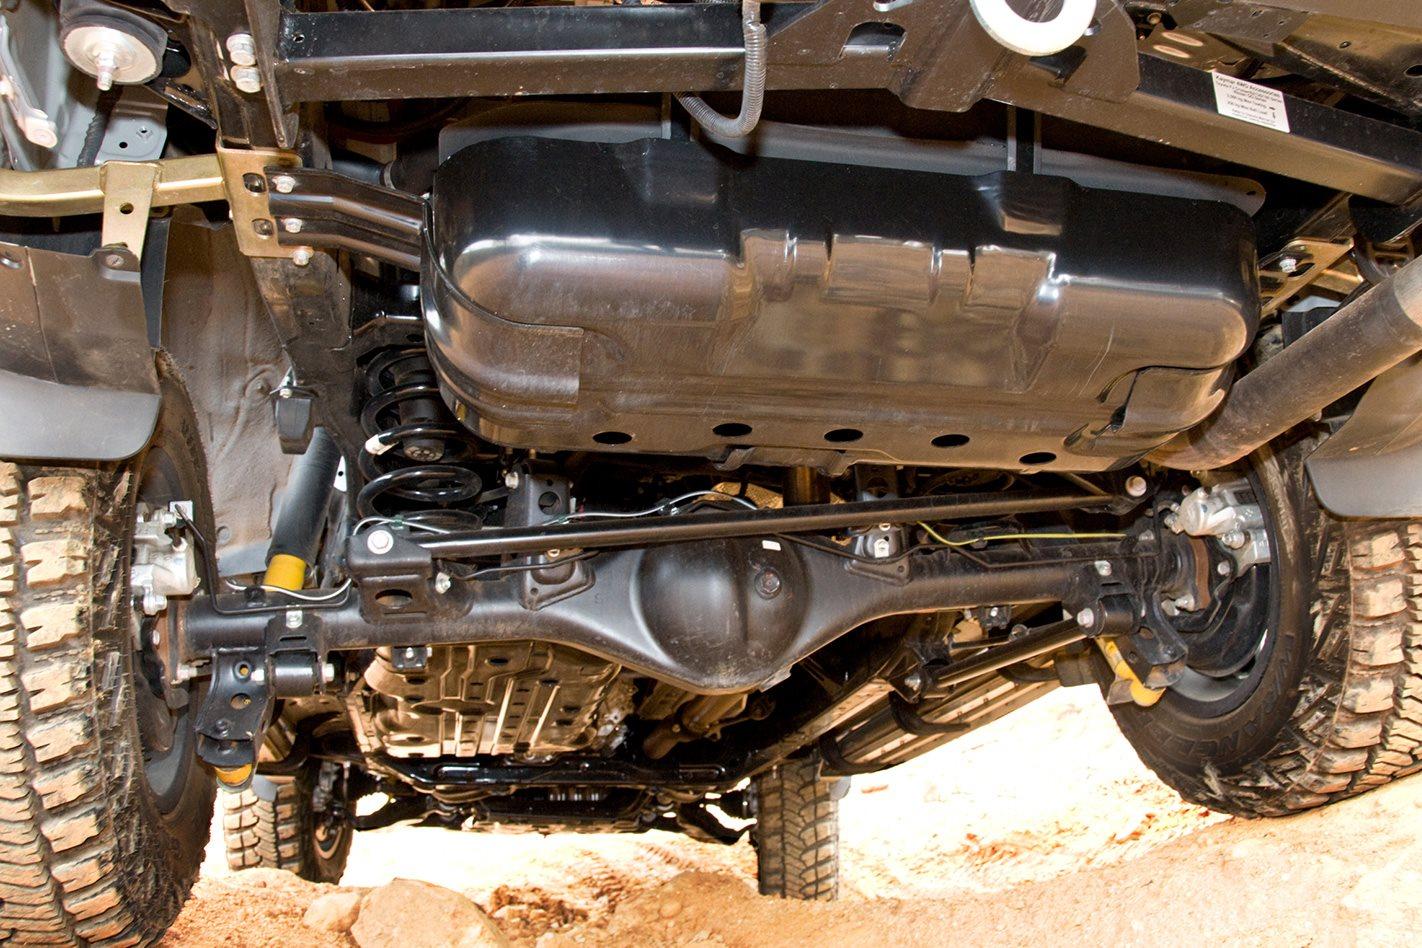 2011 Toyota Prado 150 Series GXL clutch